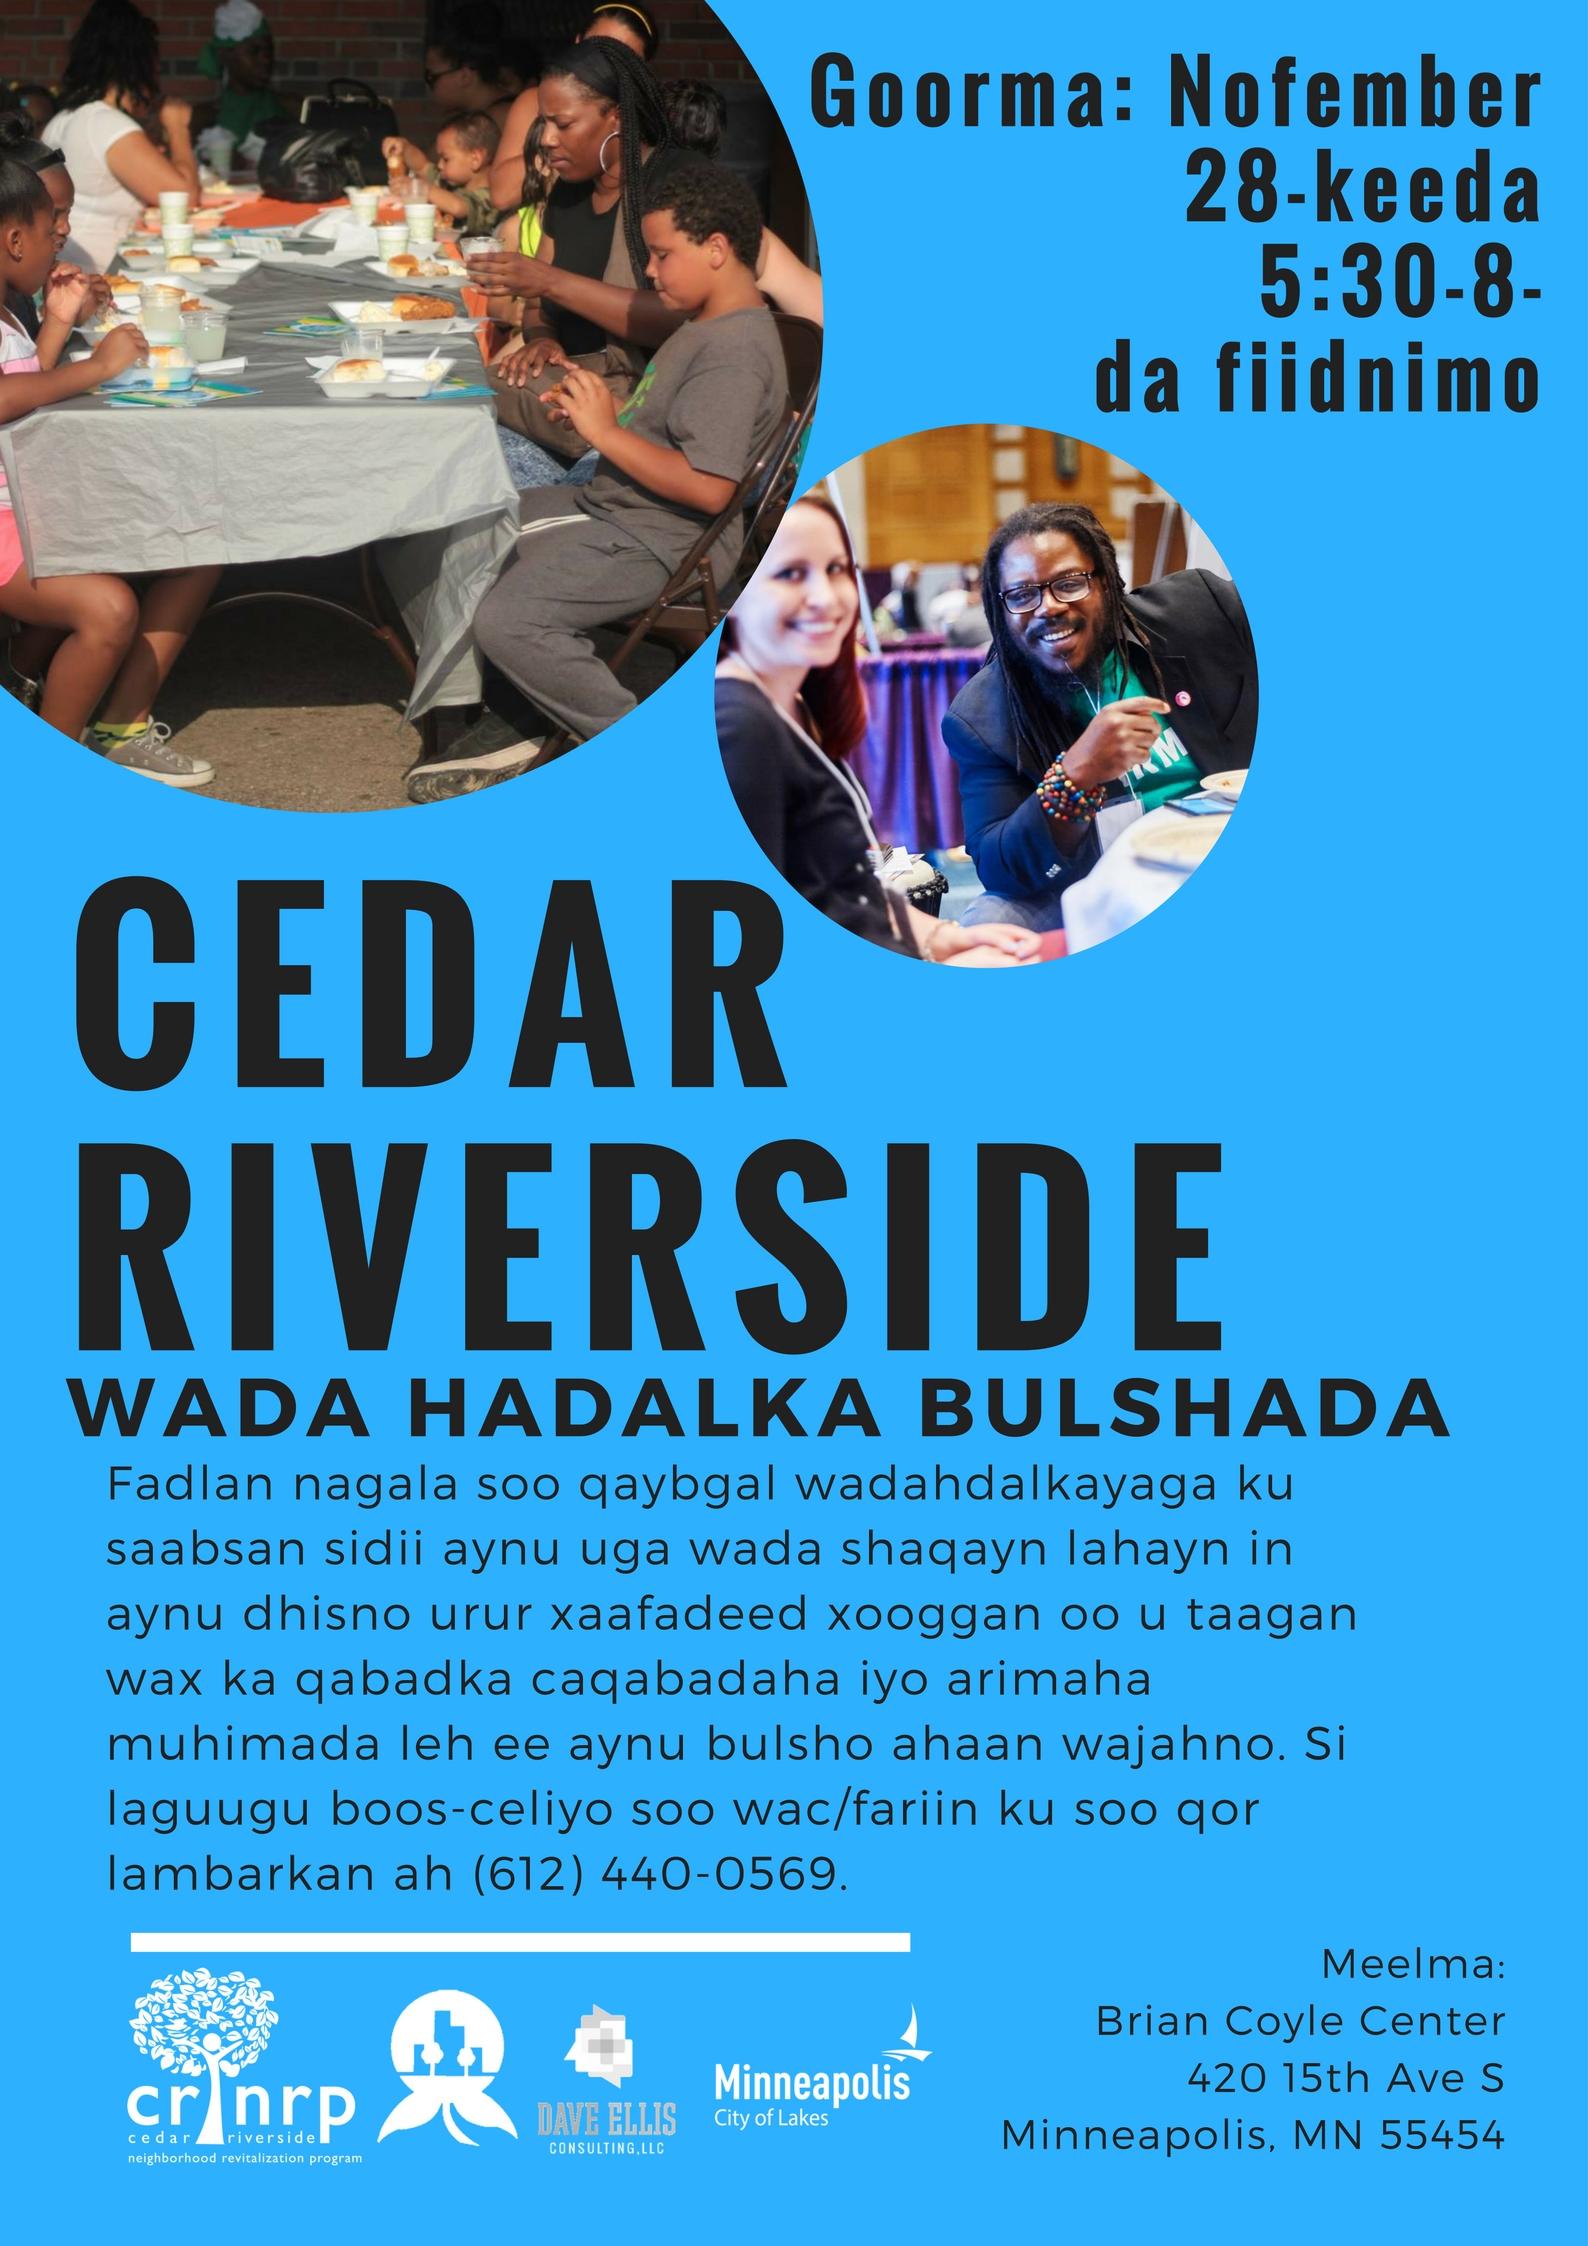 Somali_Cedar_Riverside_Community_Gathering.jpg